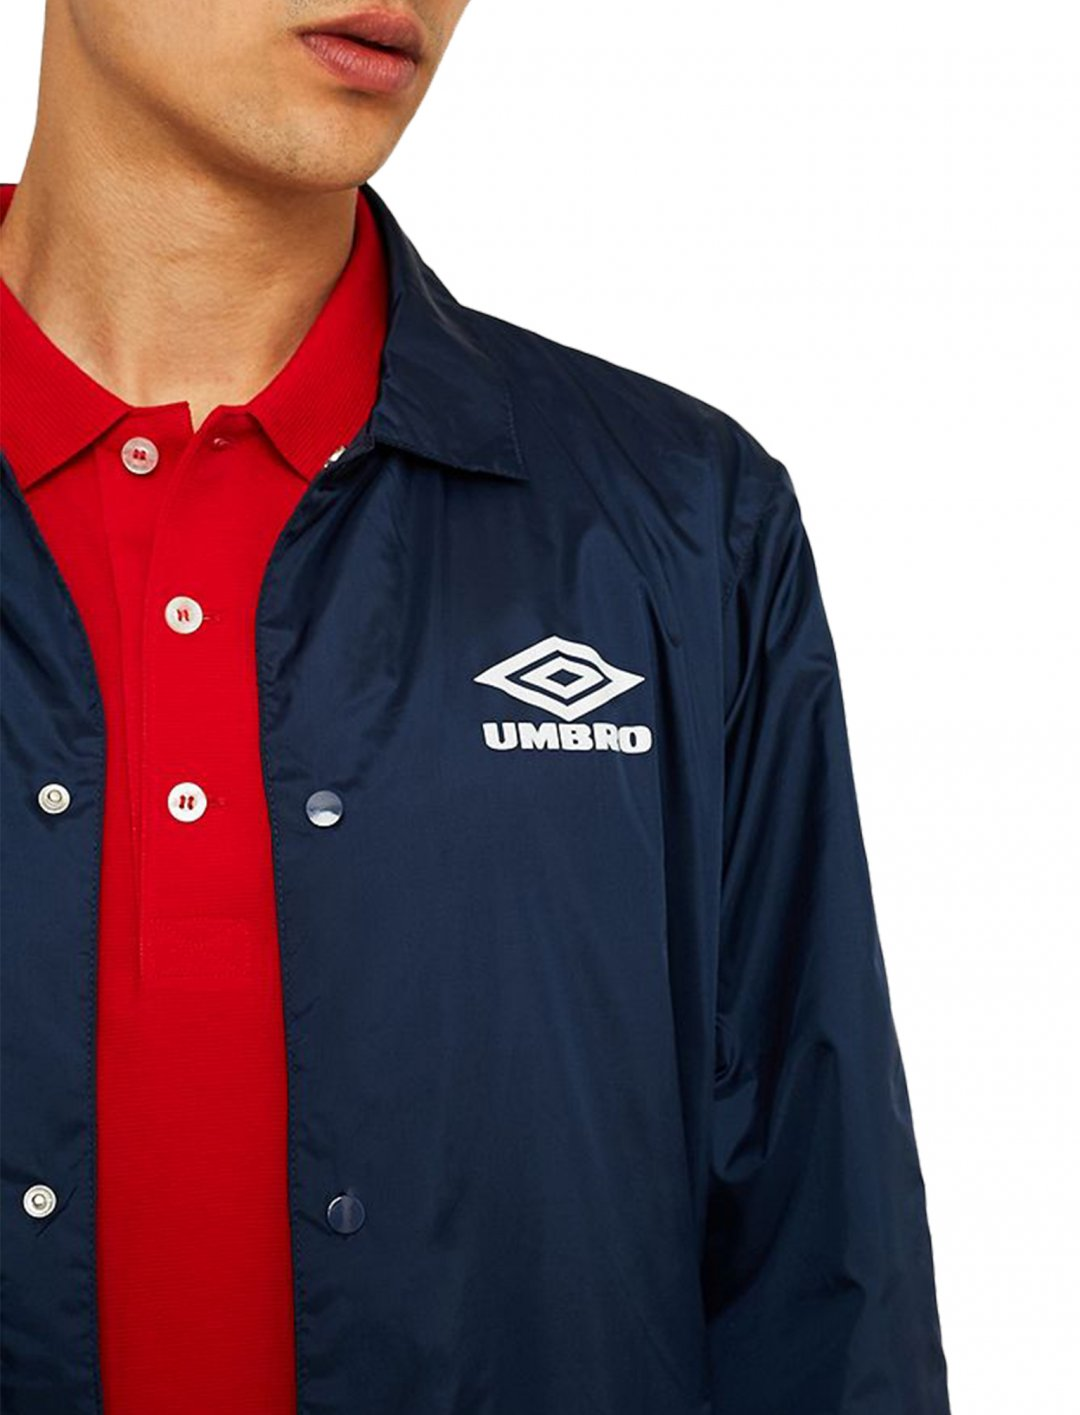 "Umbro Navy Coach Jacket {""id"":5,""product_section_id"":1,""name"":""Clothing"",""order"":5} Umbro"